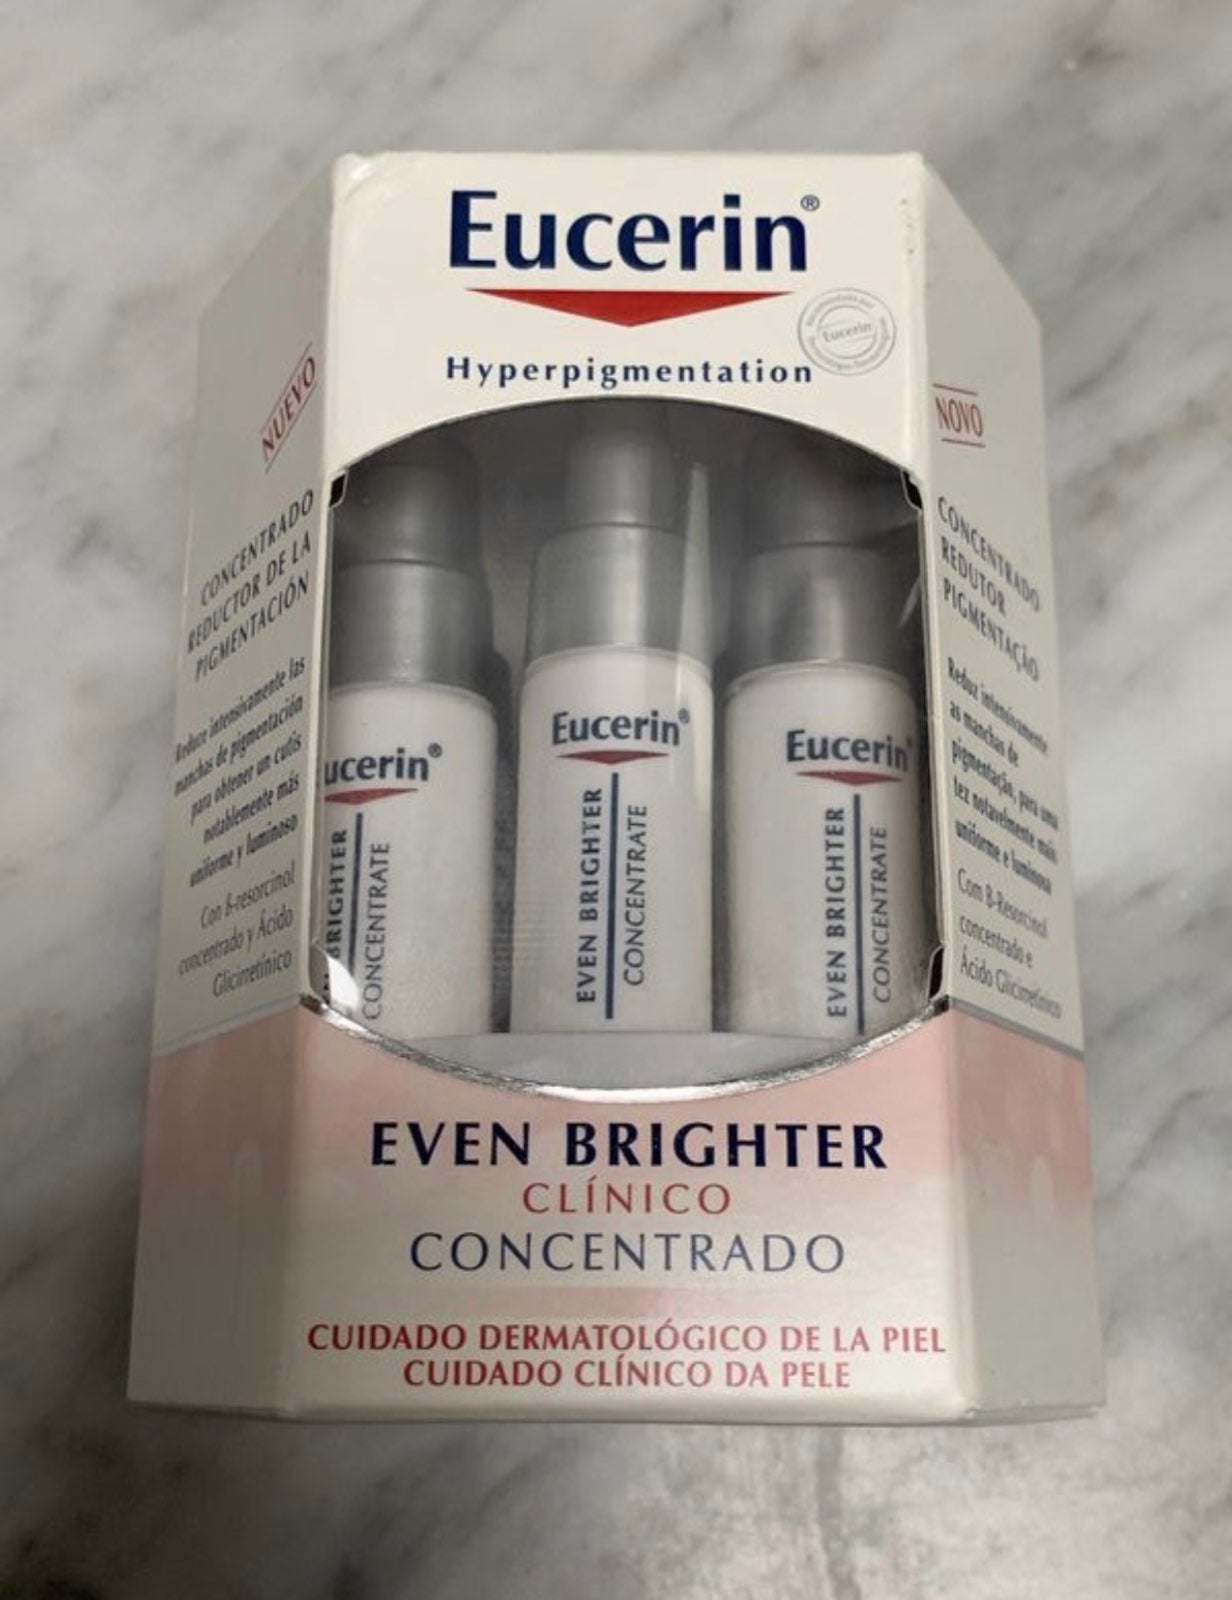 Eucerin Hyperpigmentation Drk Spot Serum